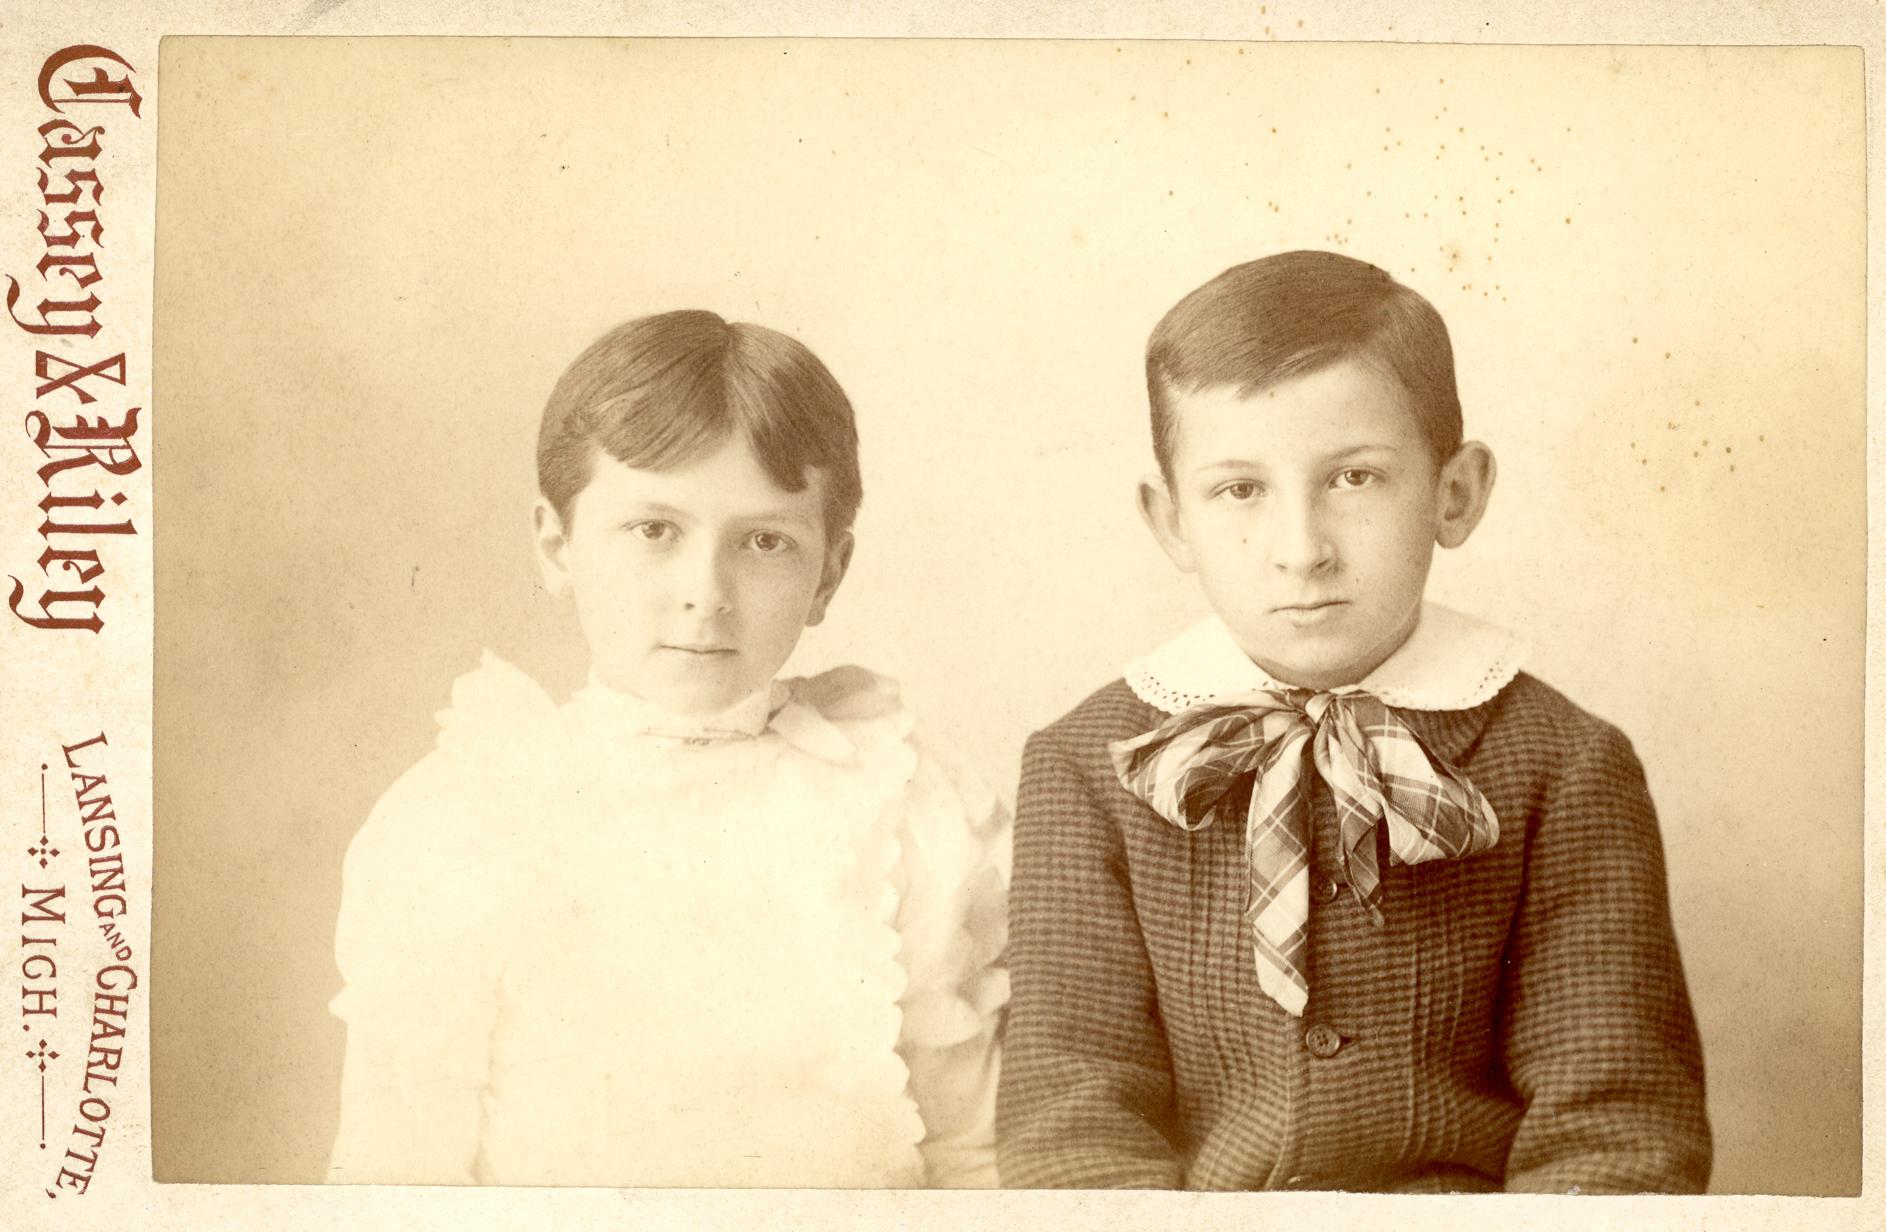 Pearl and William Roscoe Kedzie as children, undated